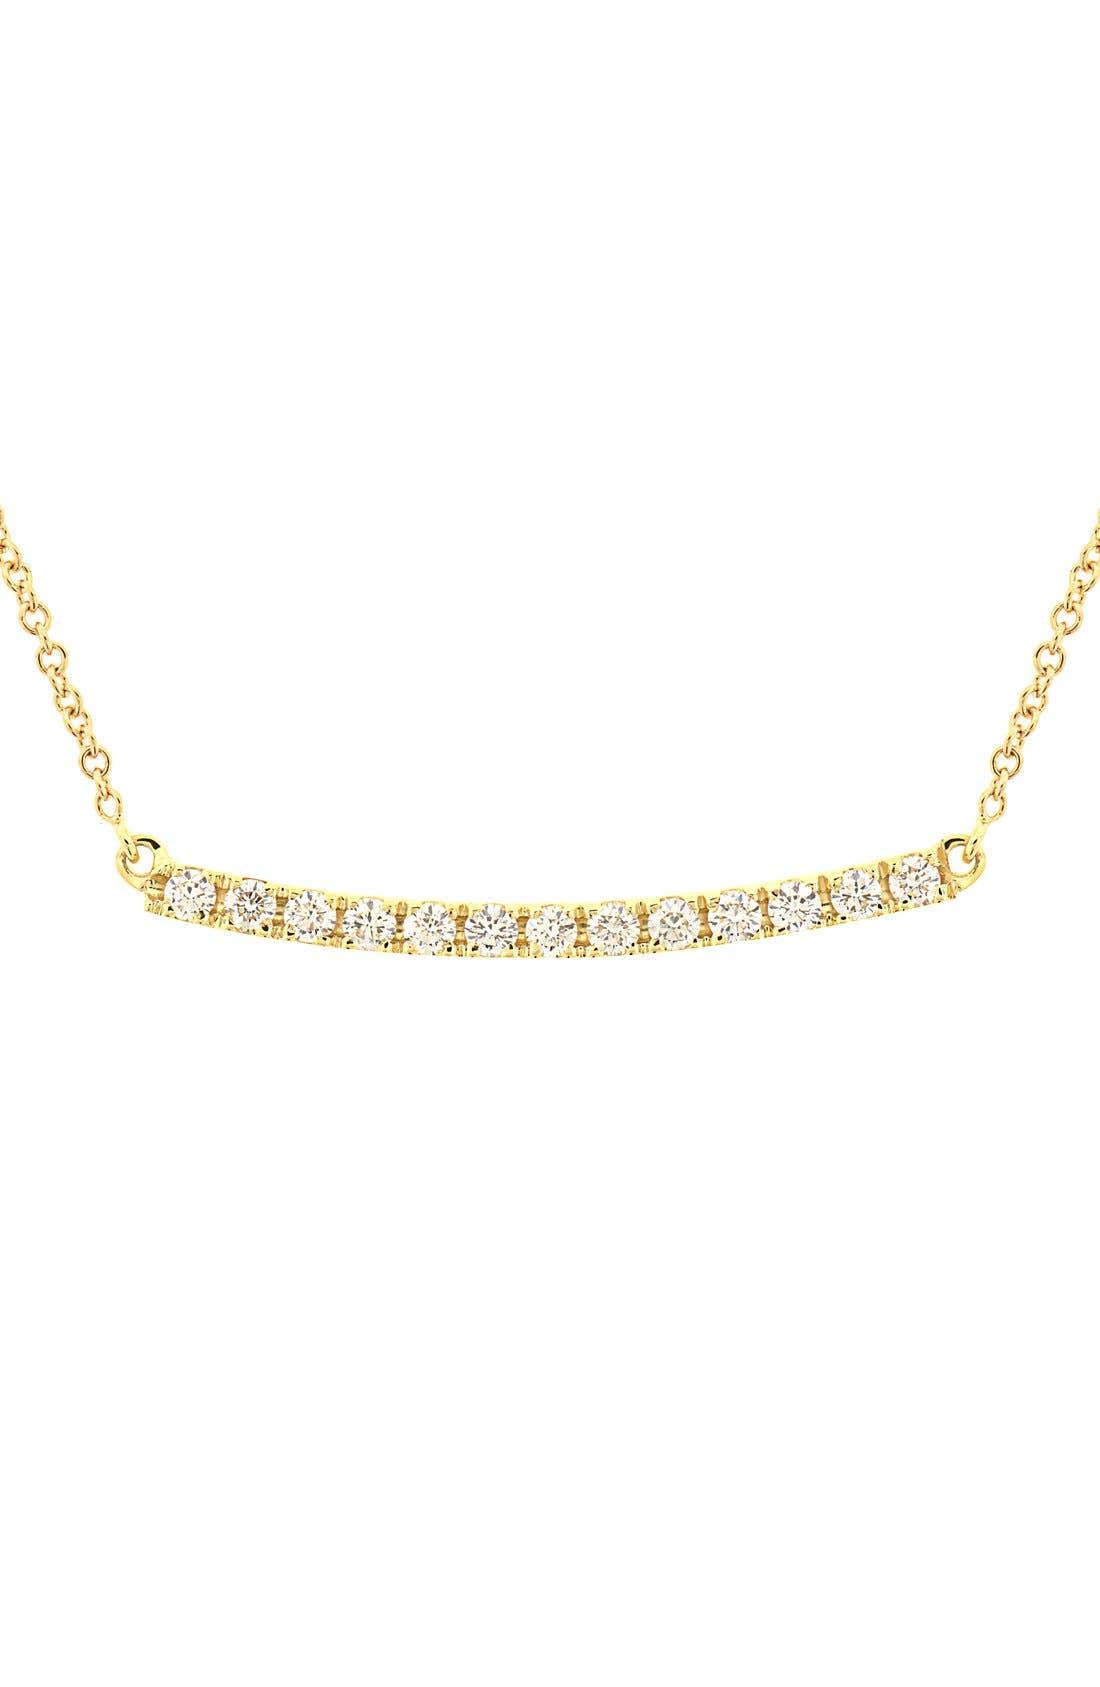 Stick Pavé Diamond Bar Necklace,                         Main,                         color, YELLOW GOLD